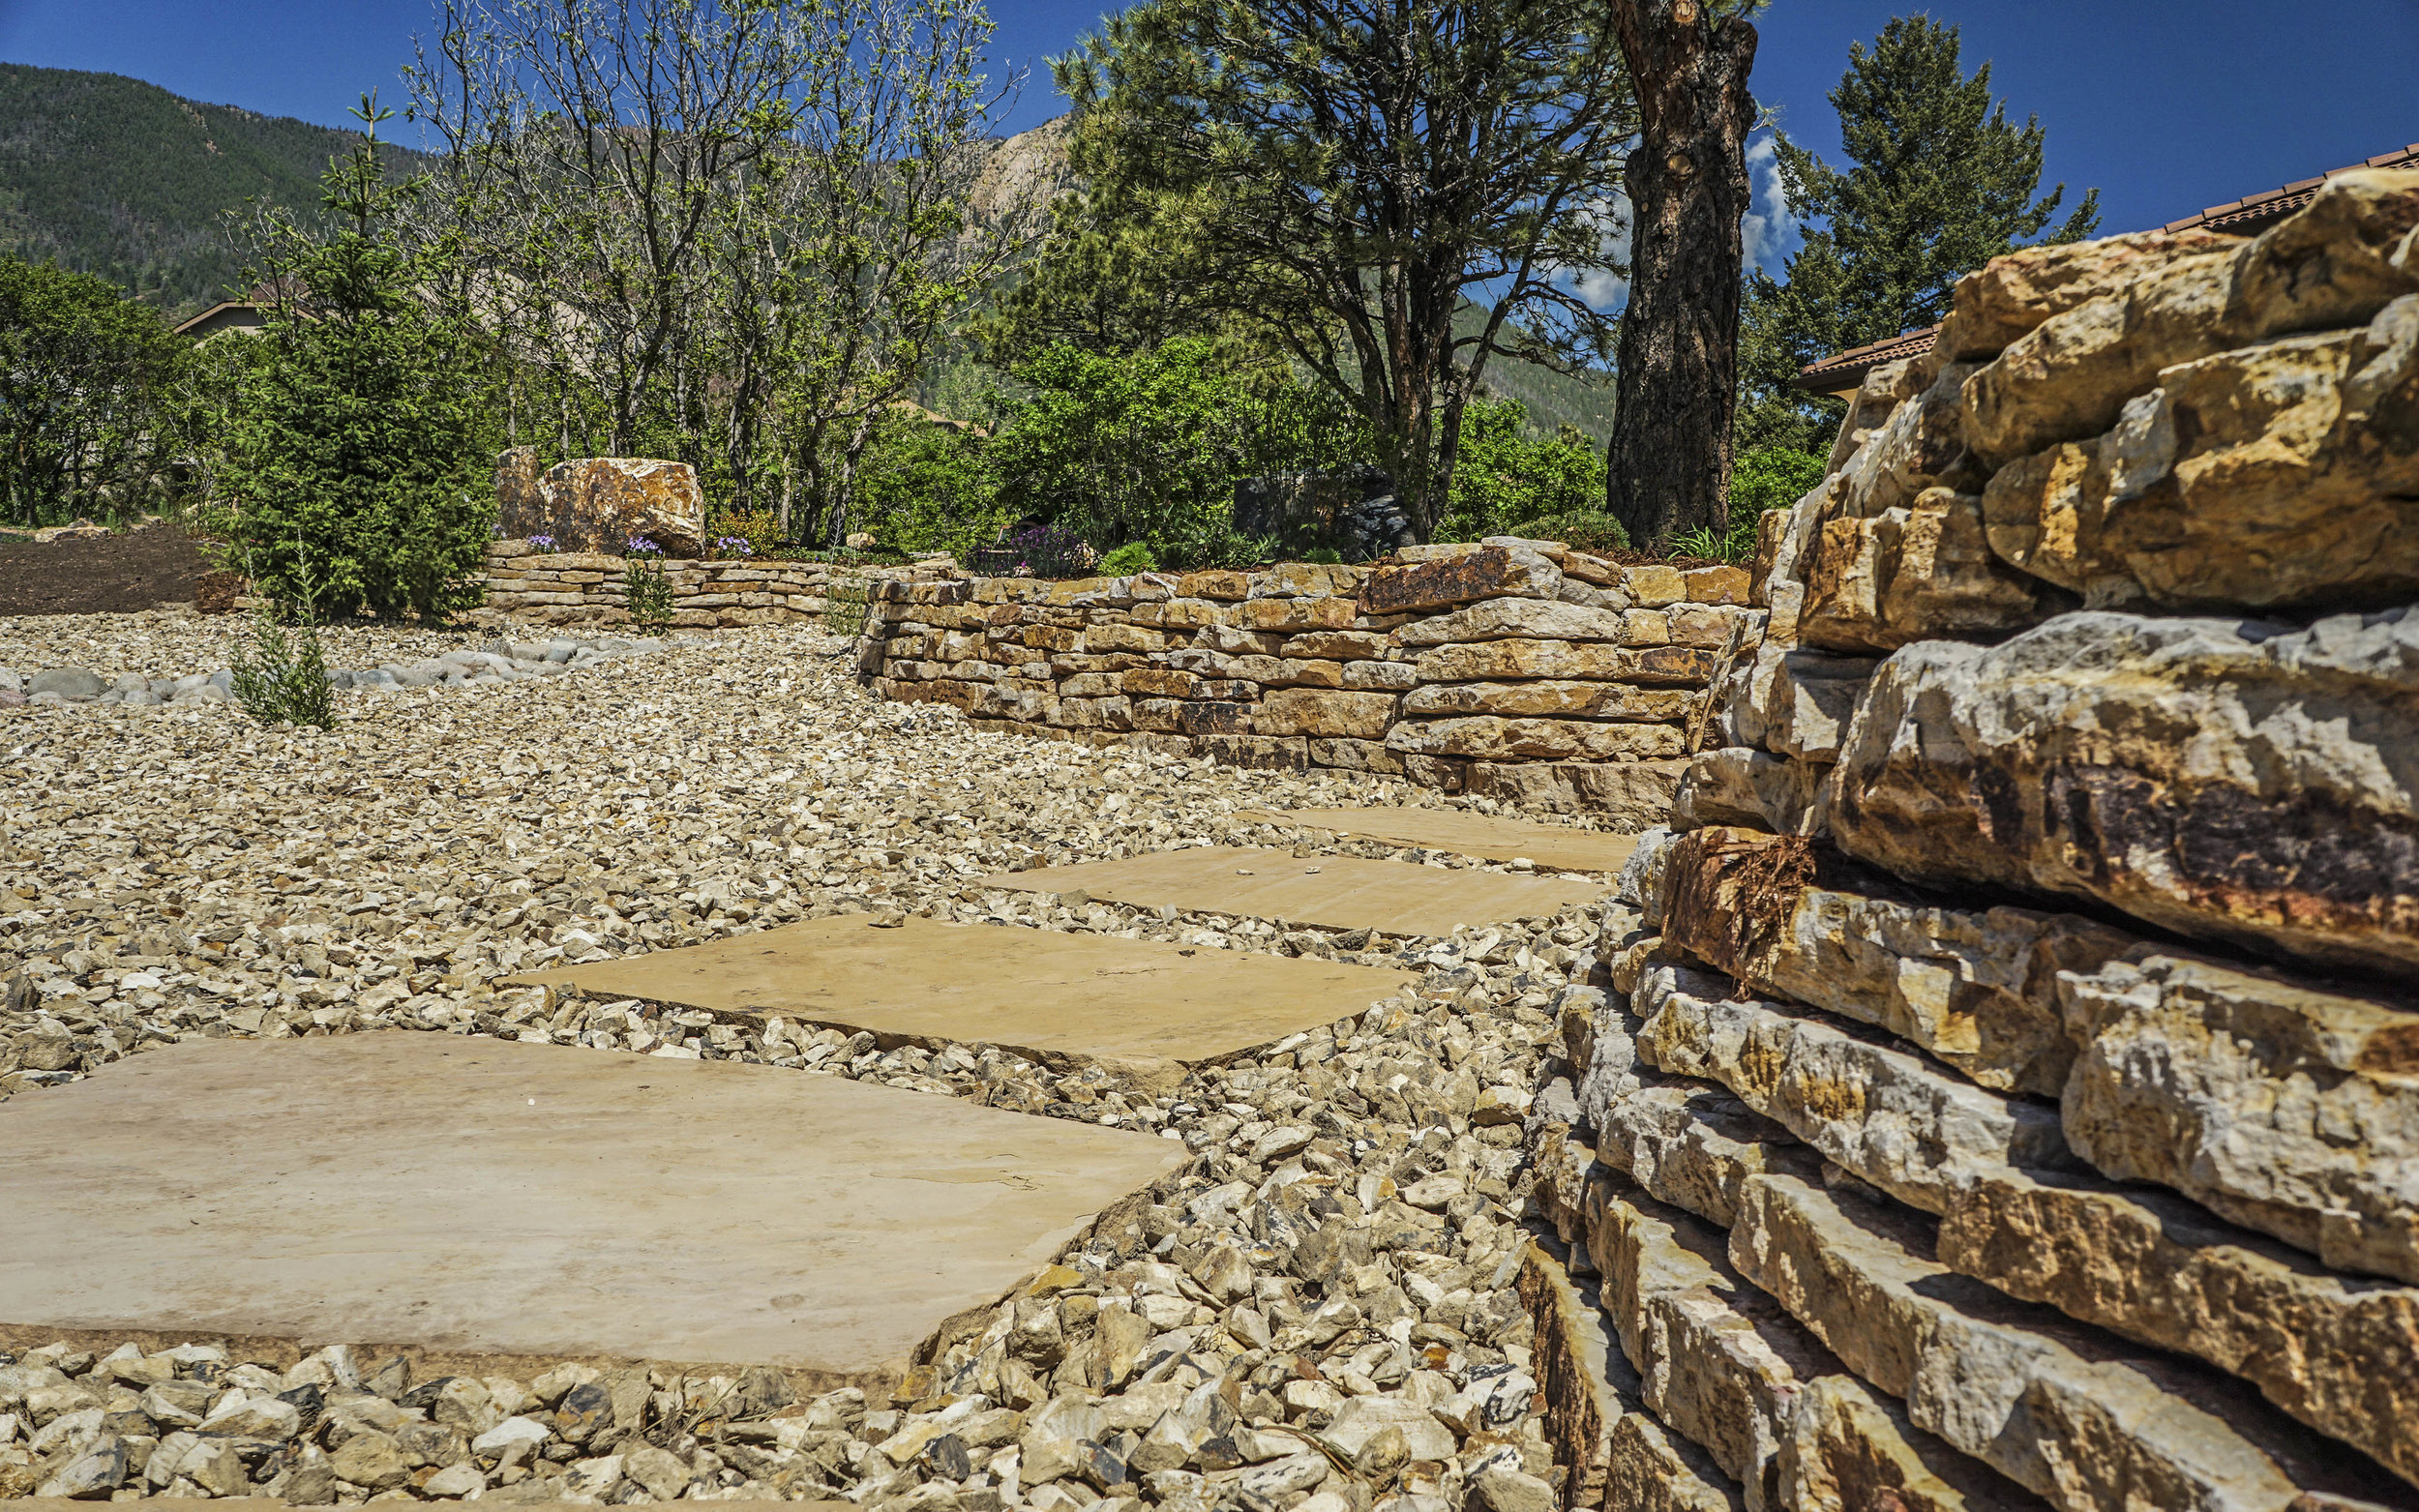 C&C Sand and Stone Colorado Decorative Rock.jpg